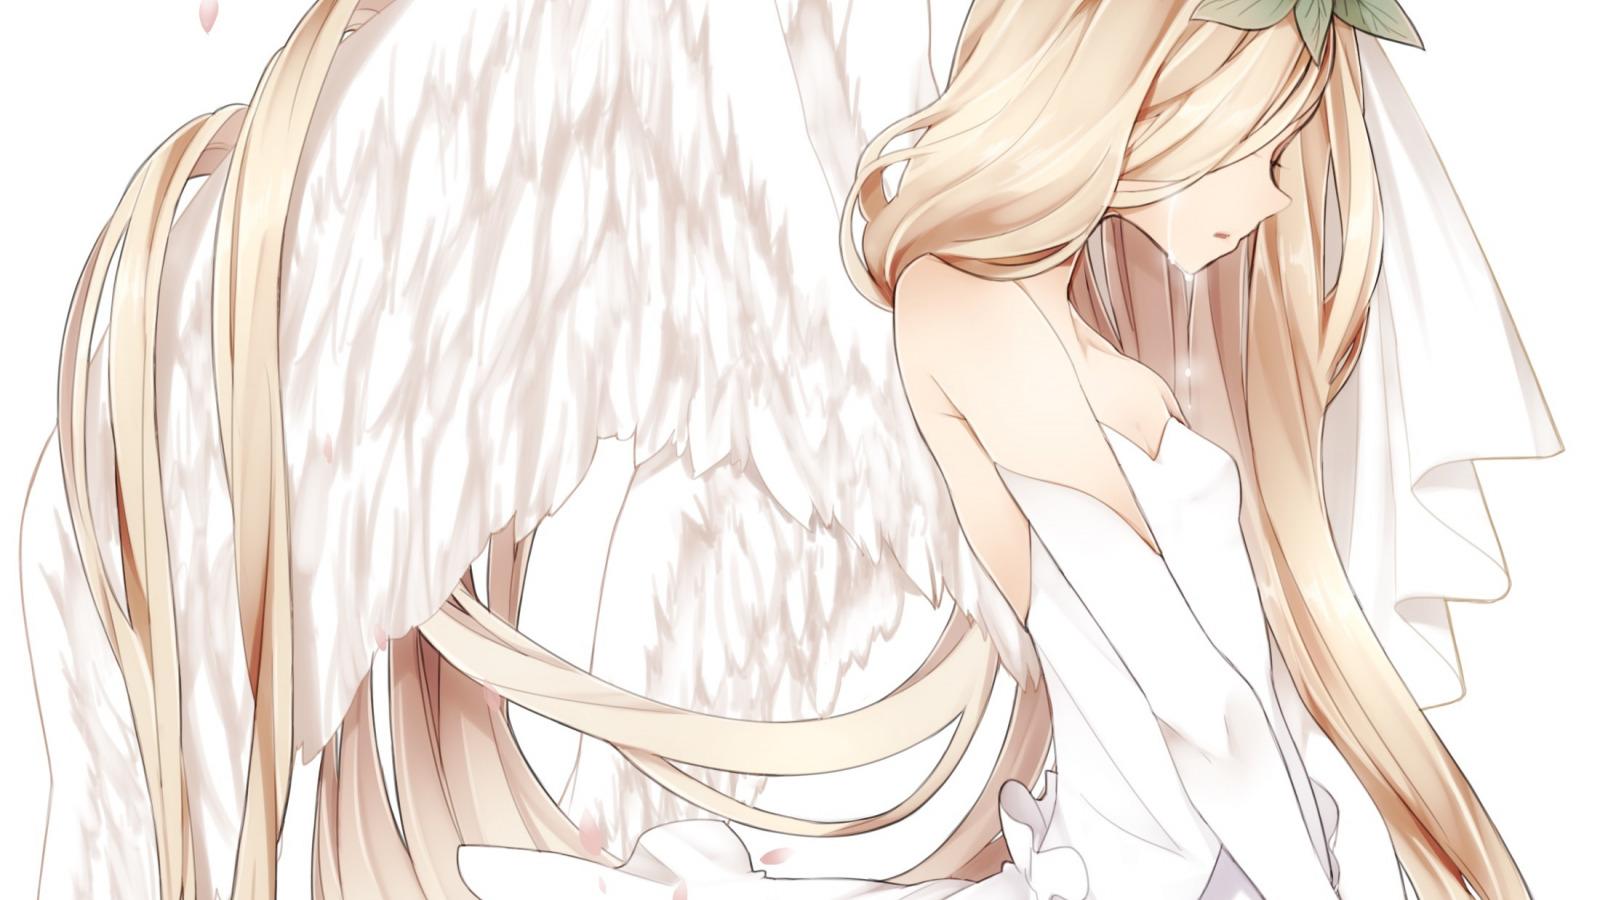 Картинки с аниме девочками ангелами, хаски бандита